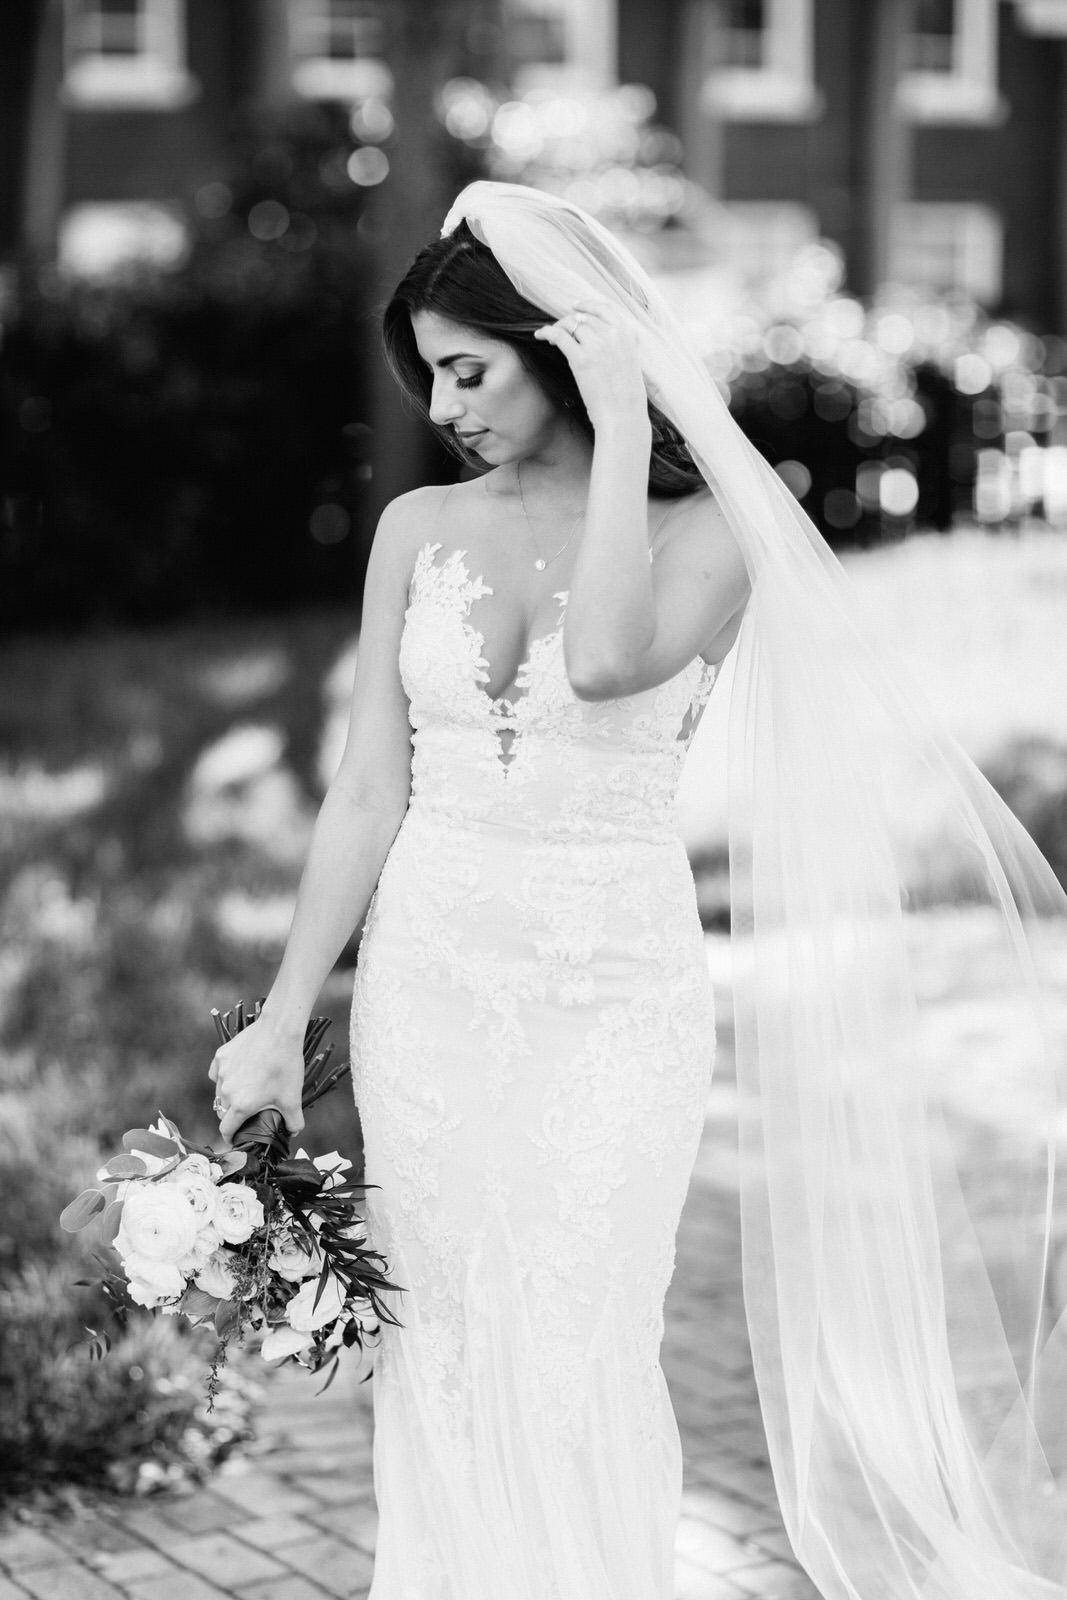 Black and white bride photos